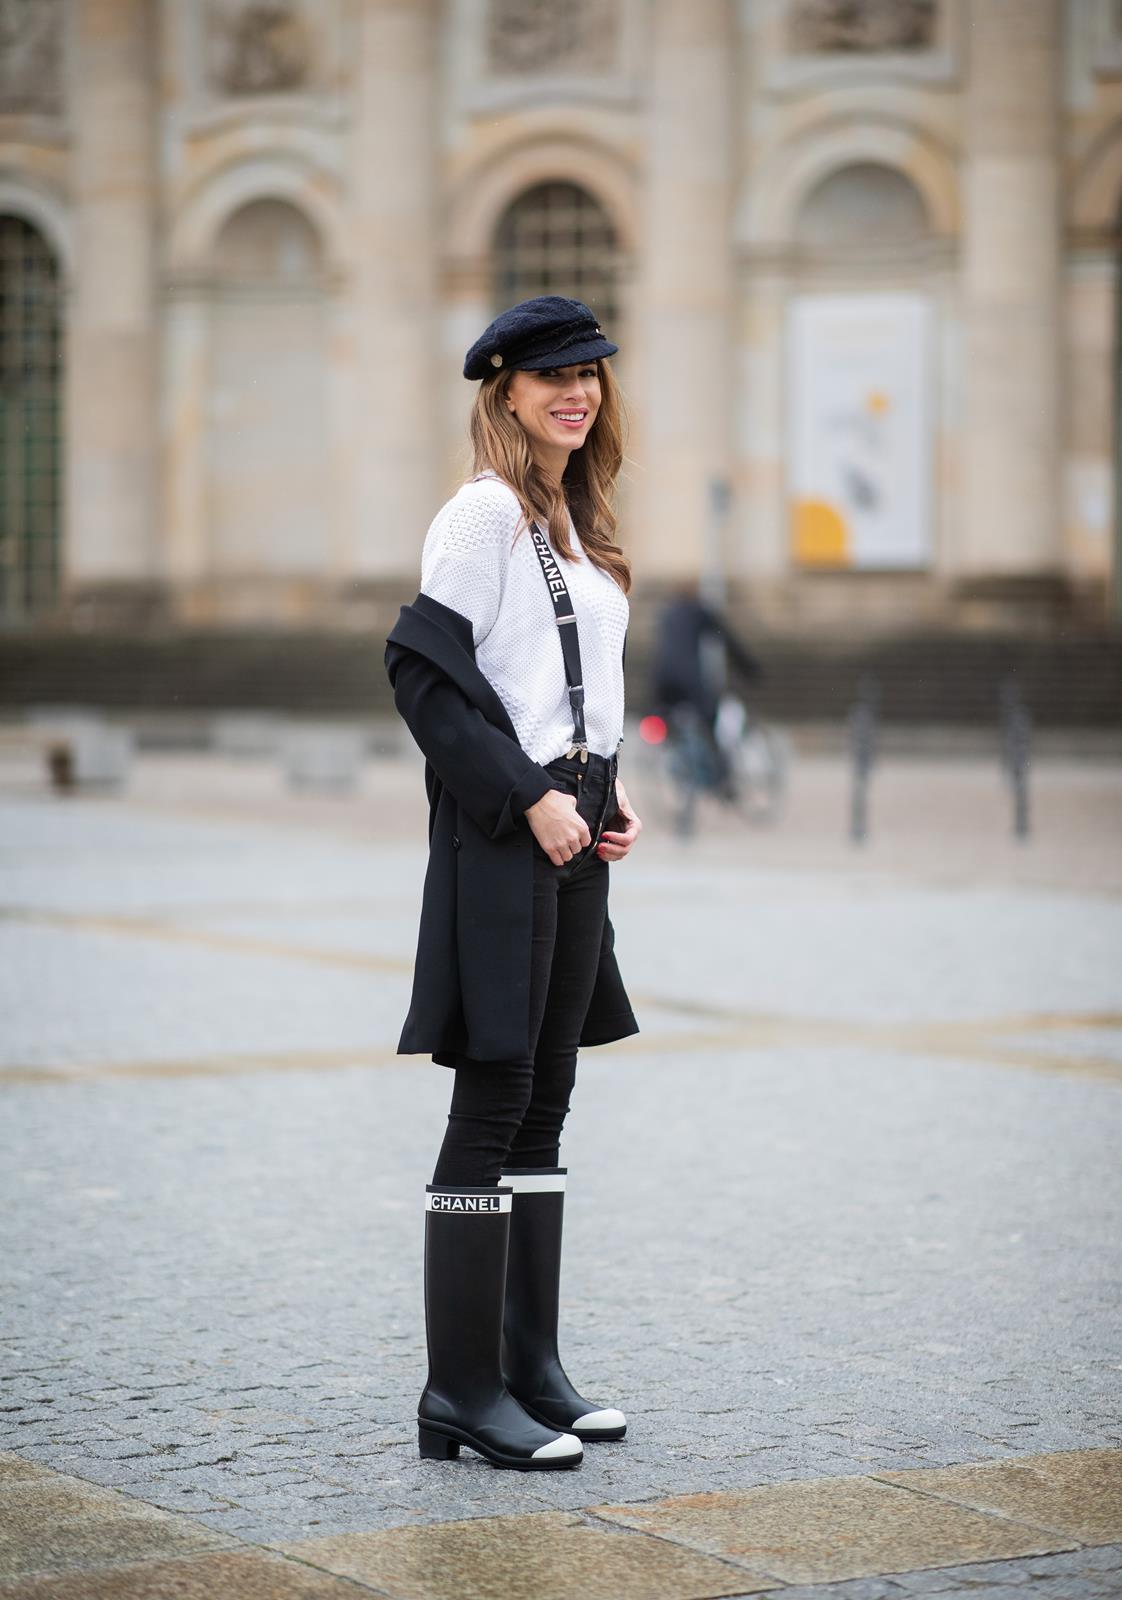 CHANEL RAIN BOOTS - Blog - Alexandra Lapp